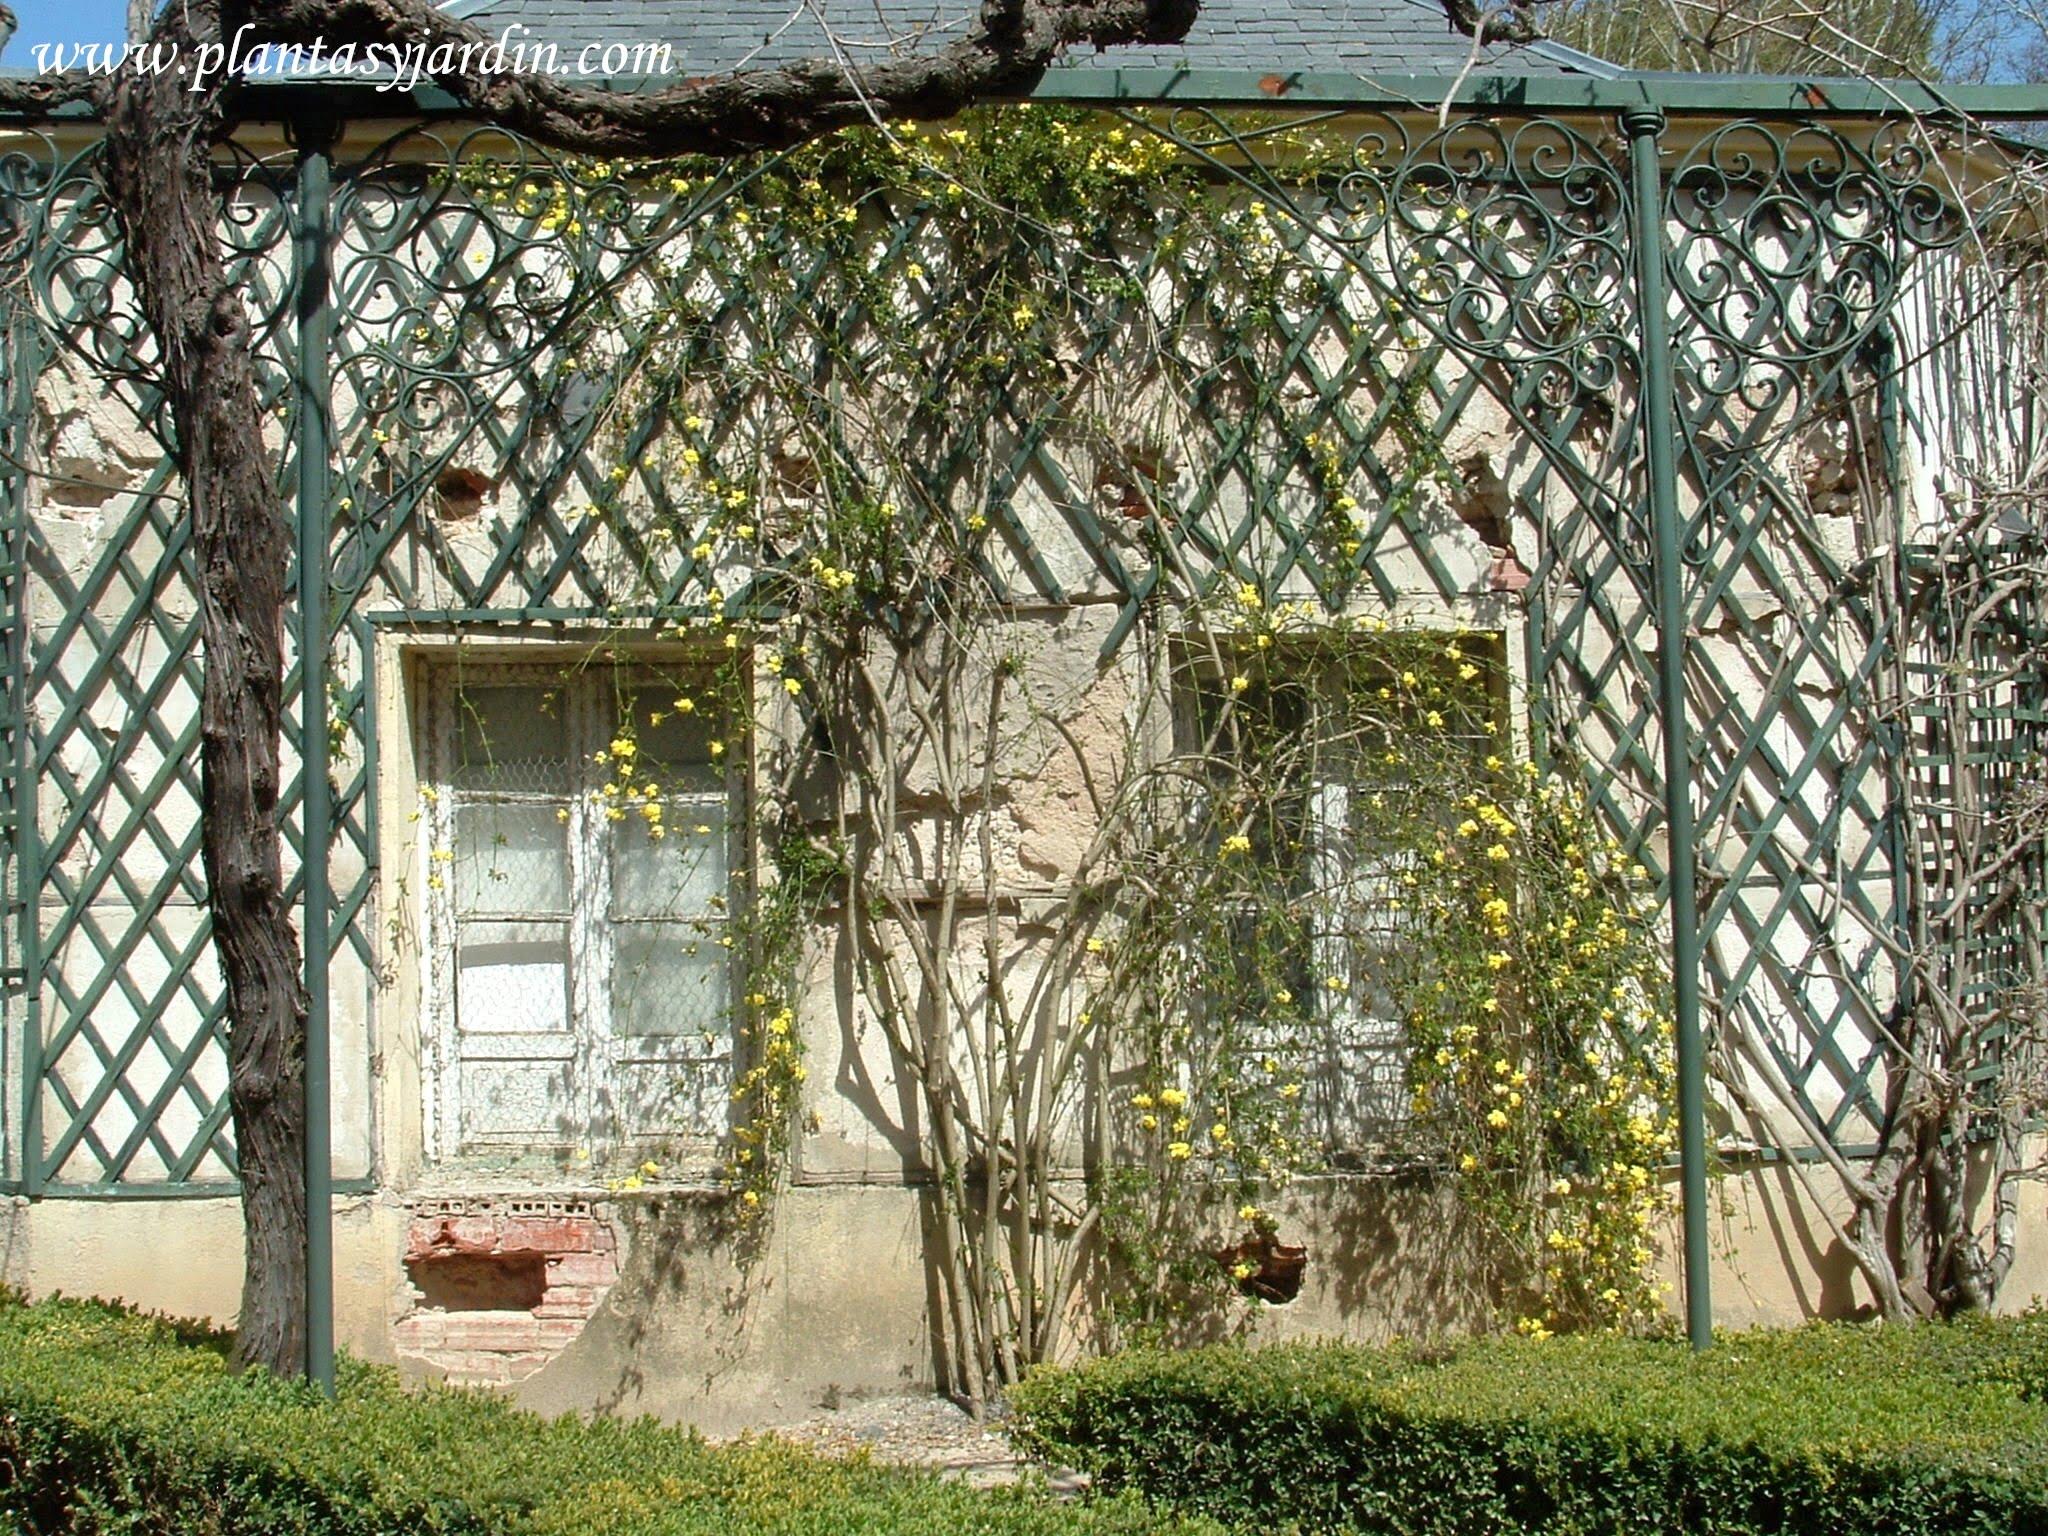 fachada cubierta con treillage y Jasminum nudiflorum